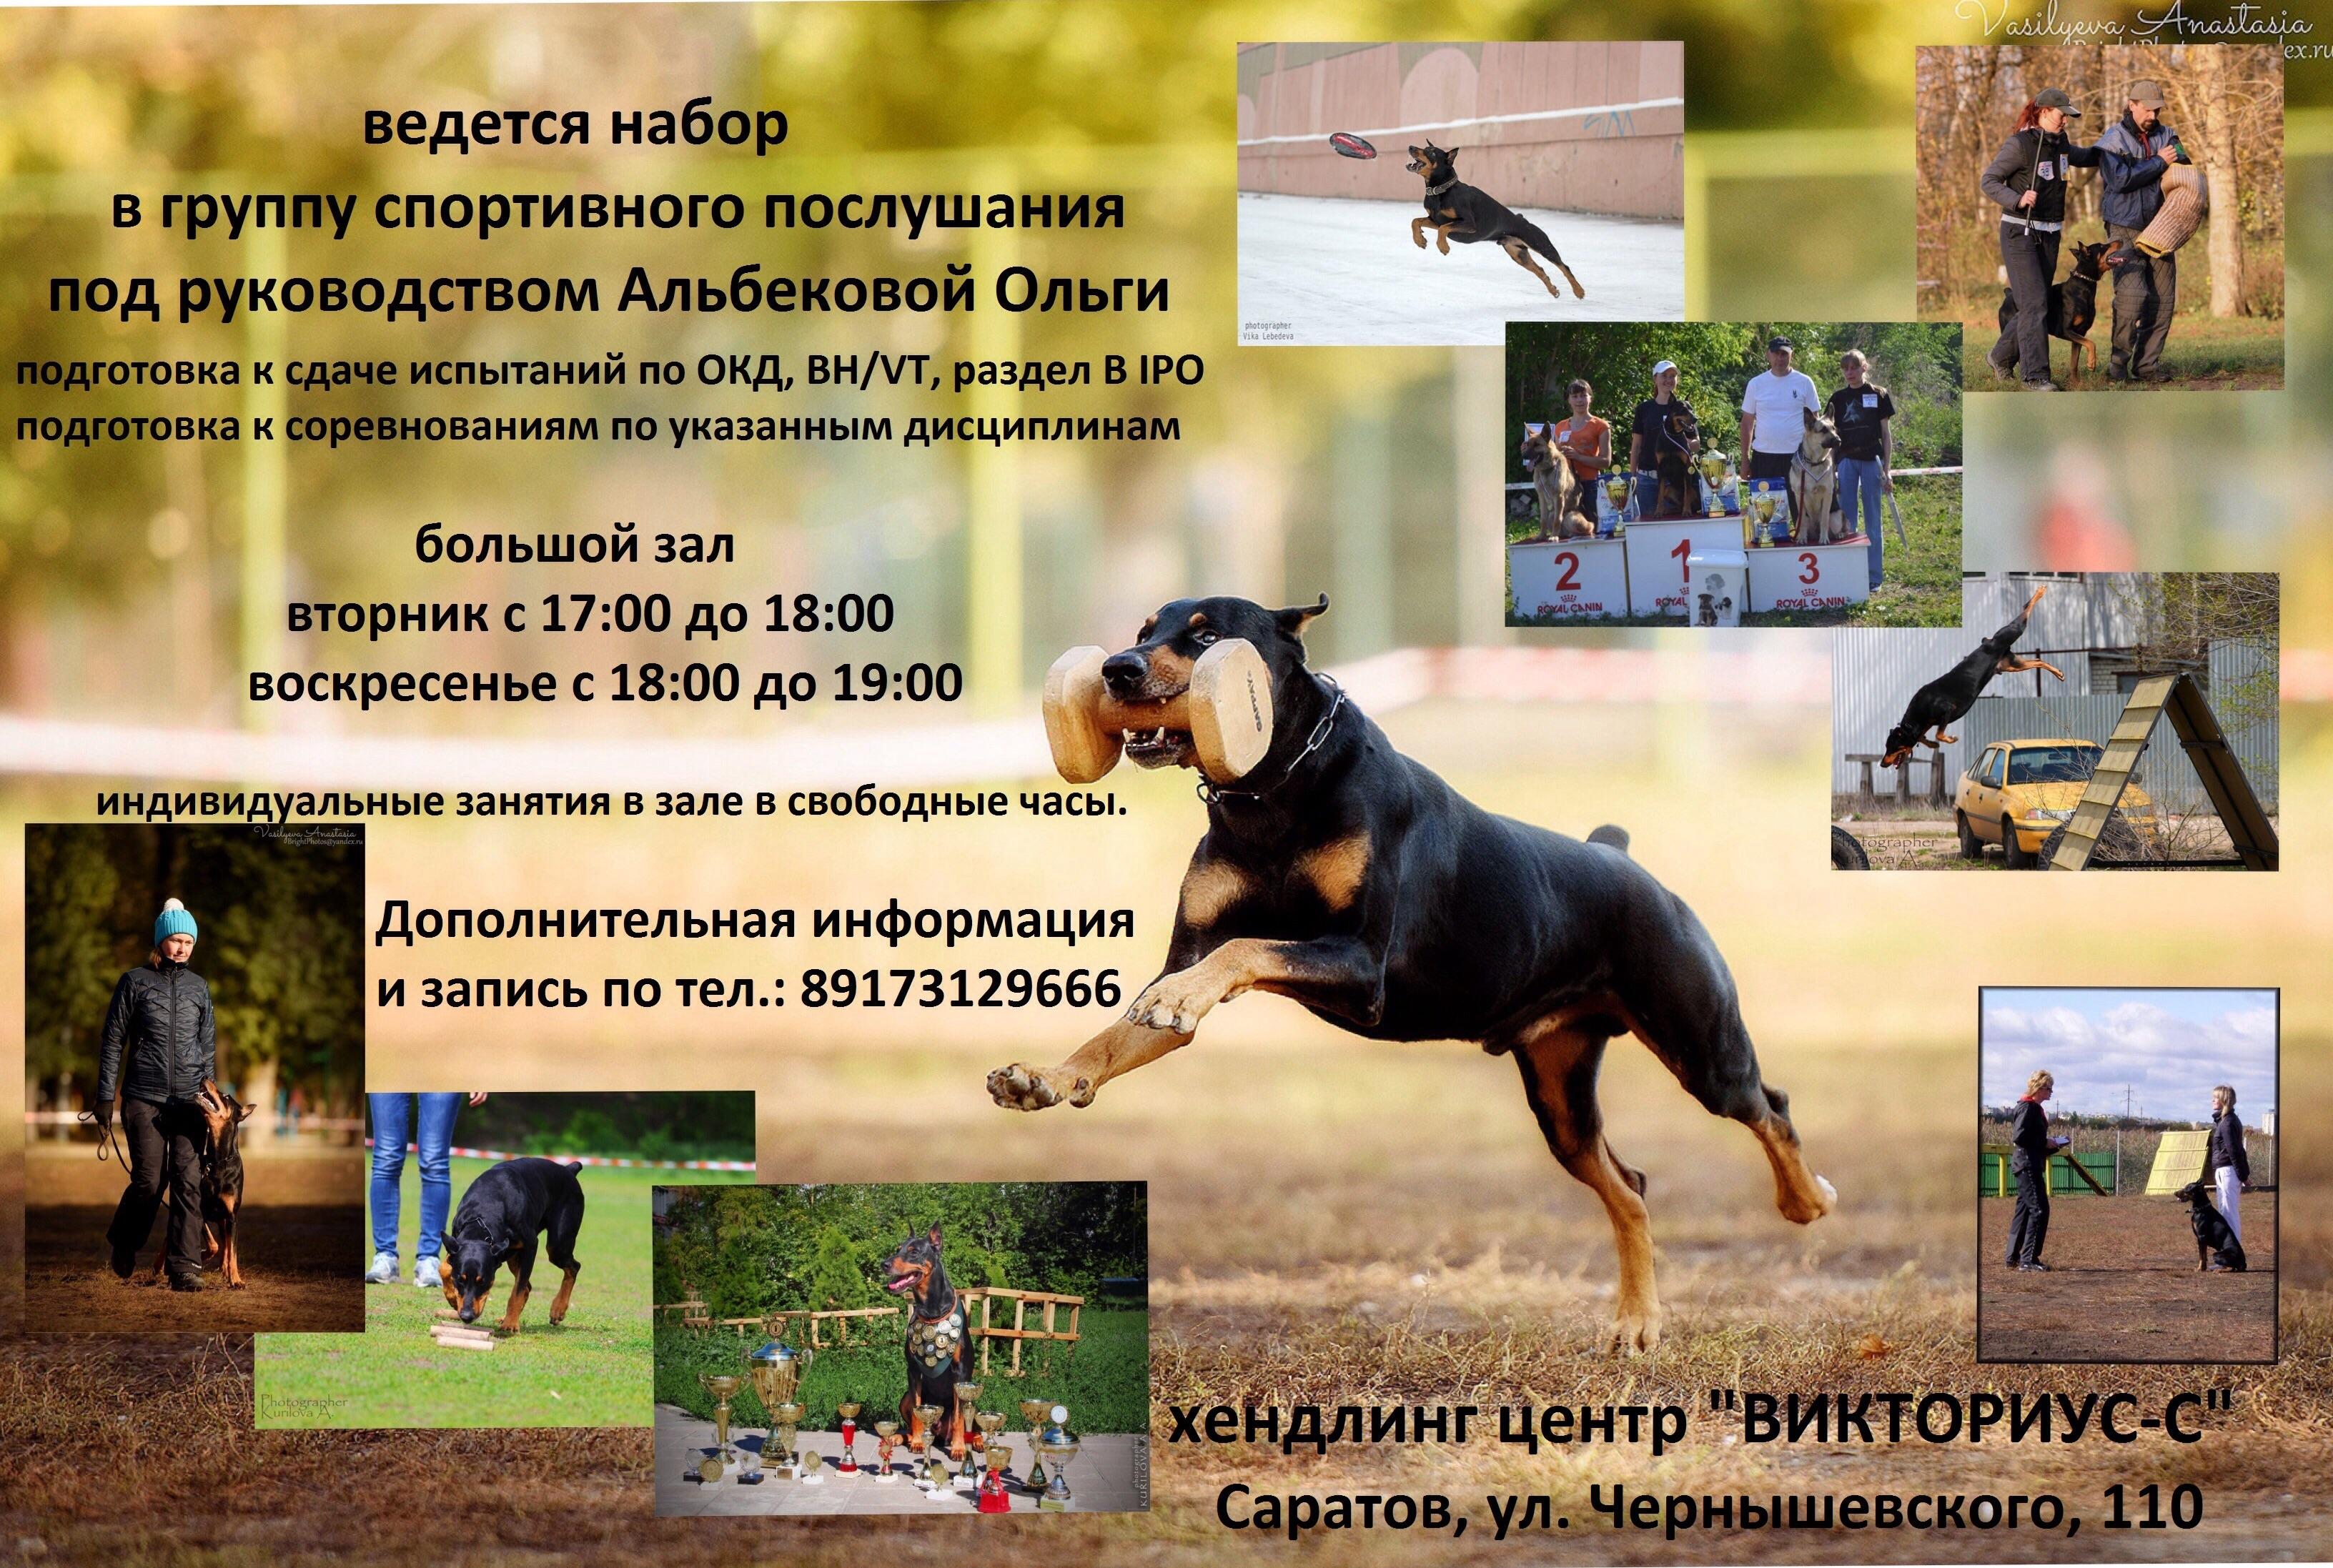 http://s2.uploads.ru/bCdyn.jpg